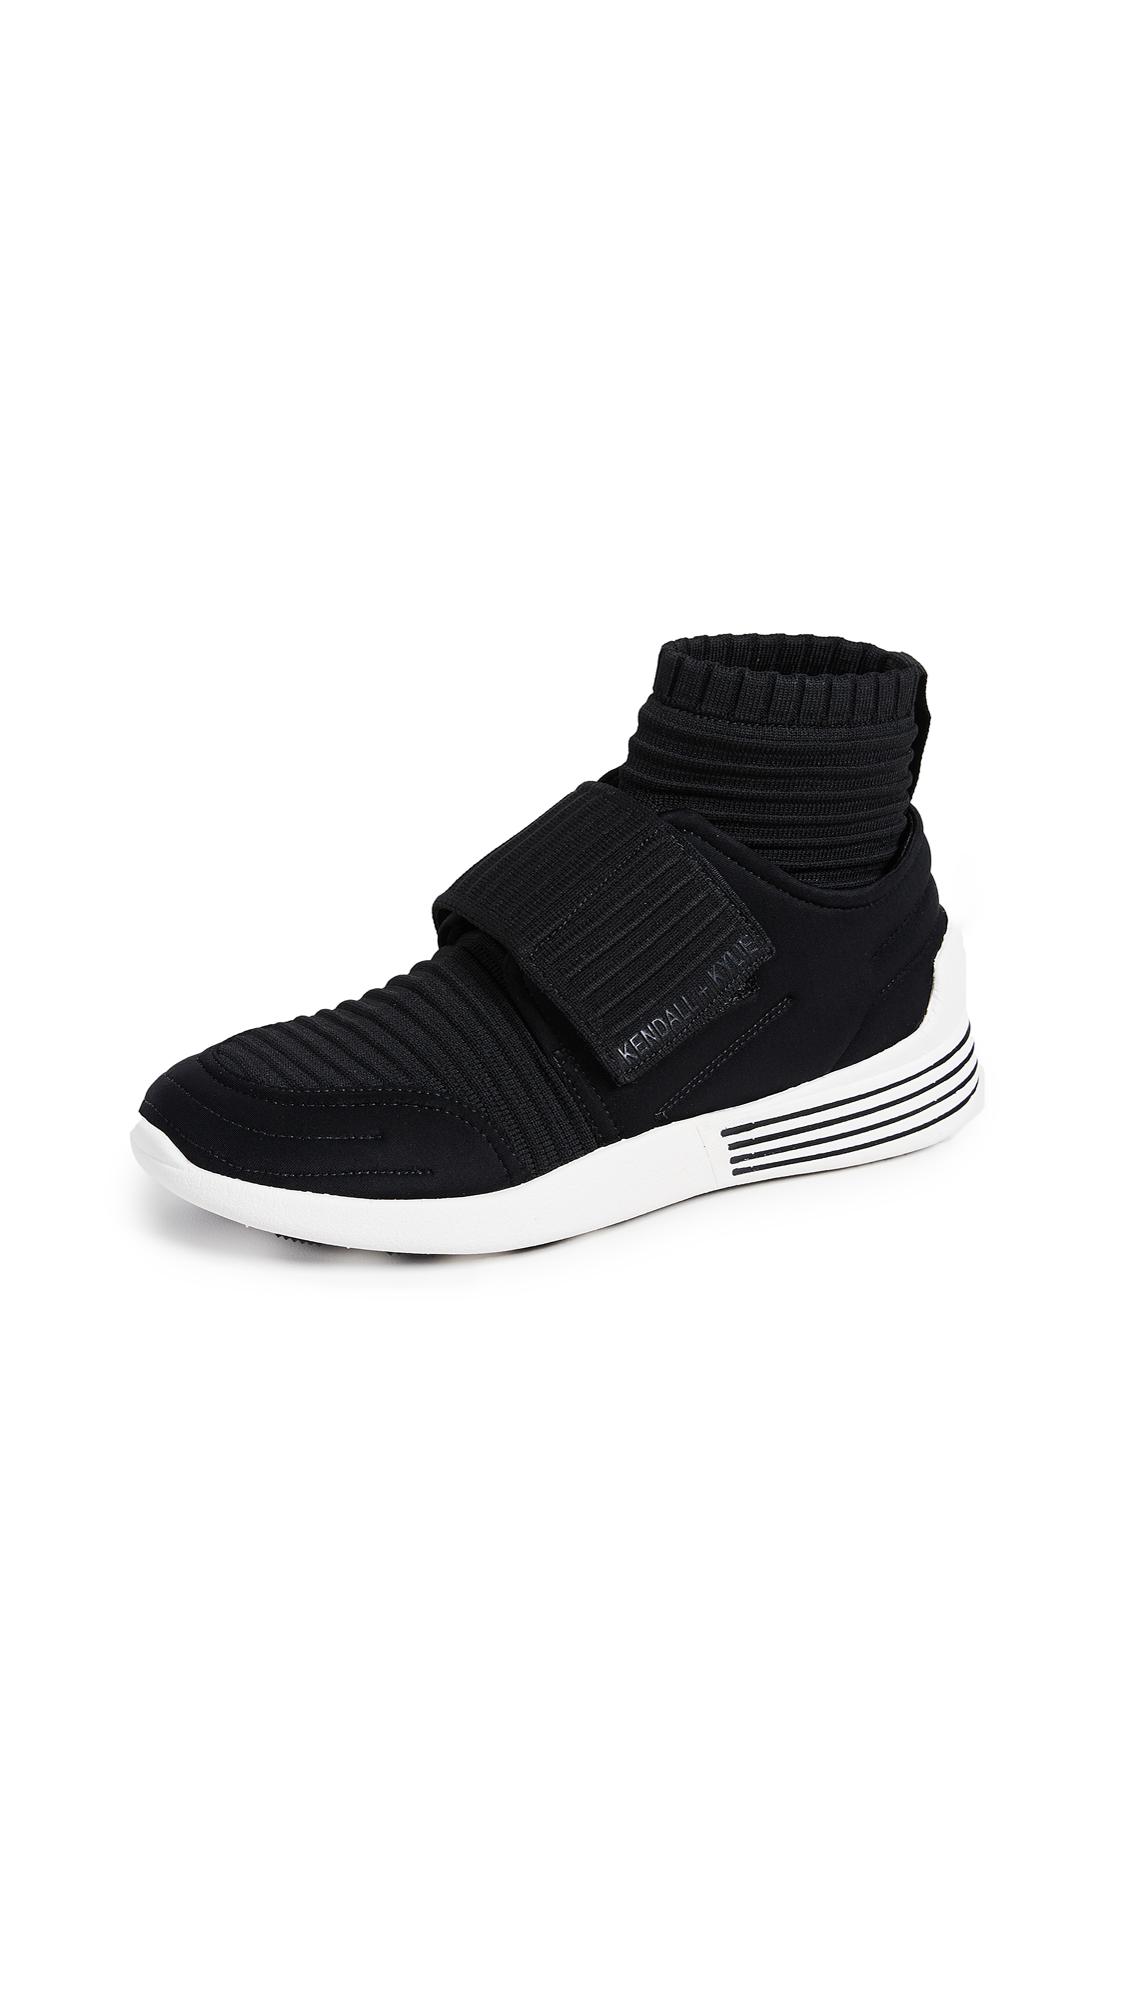 KENDALL + KYLIE Brax Knit Sneakers